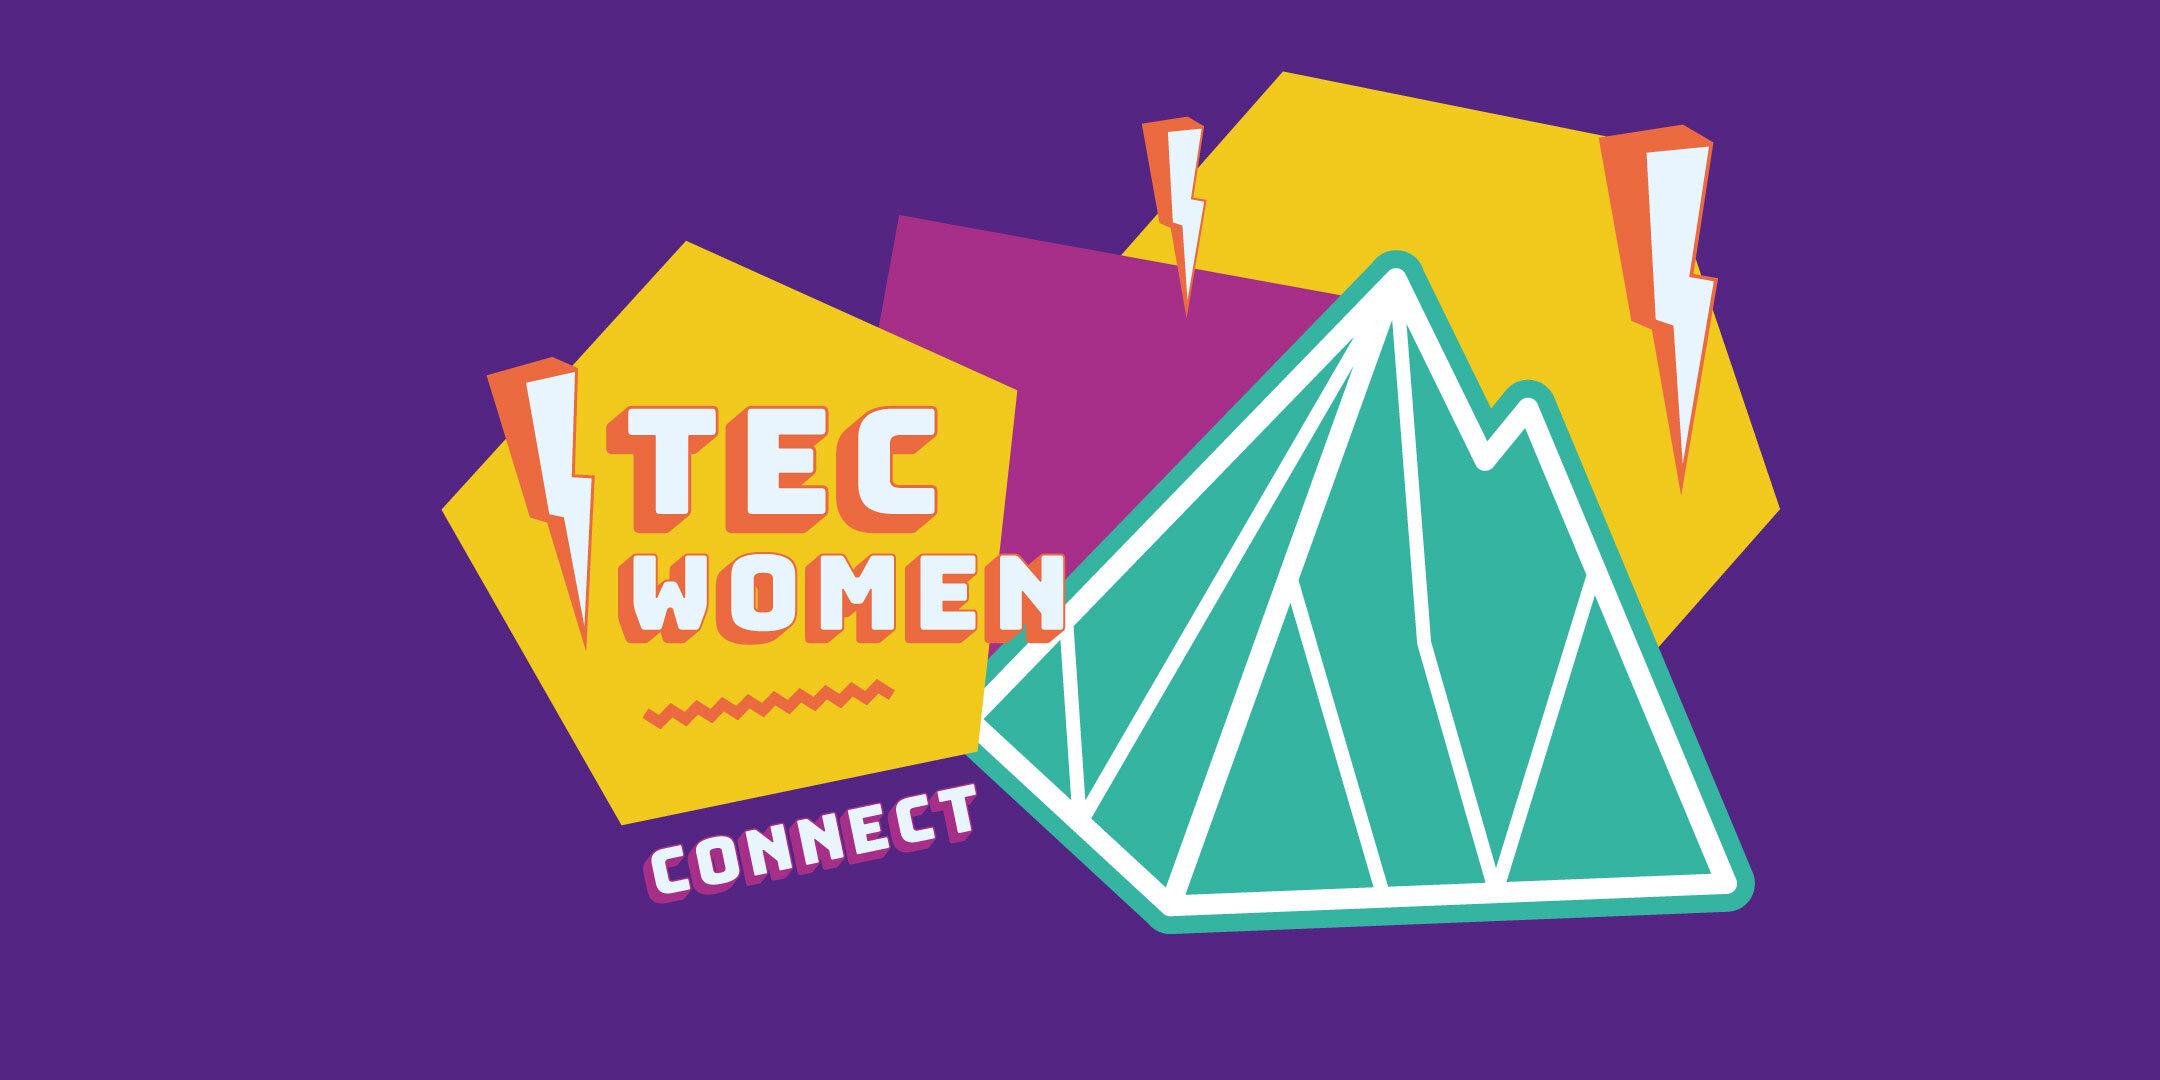 TECwomen Connect